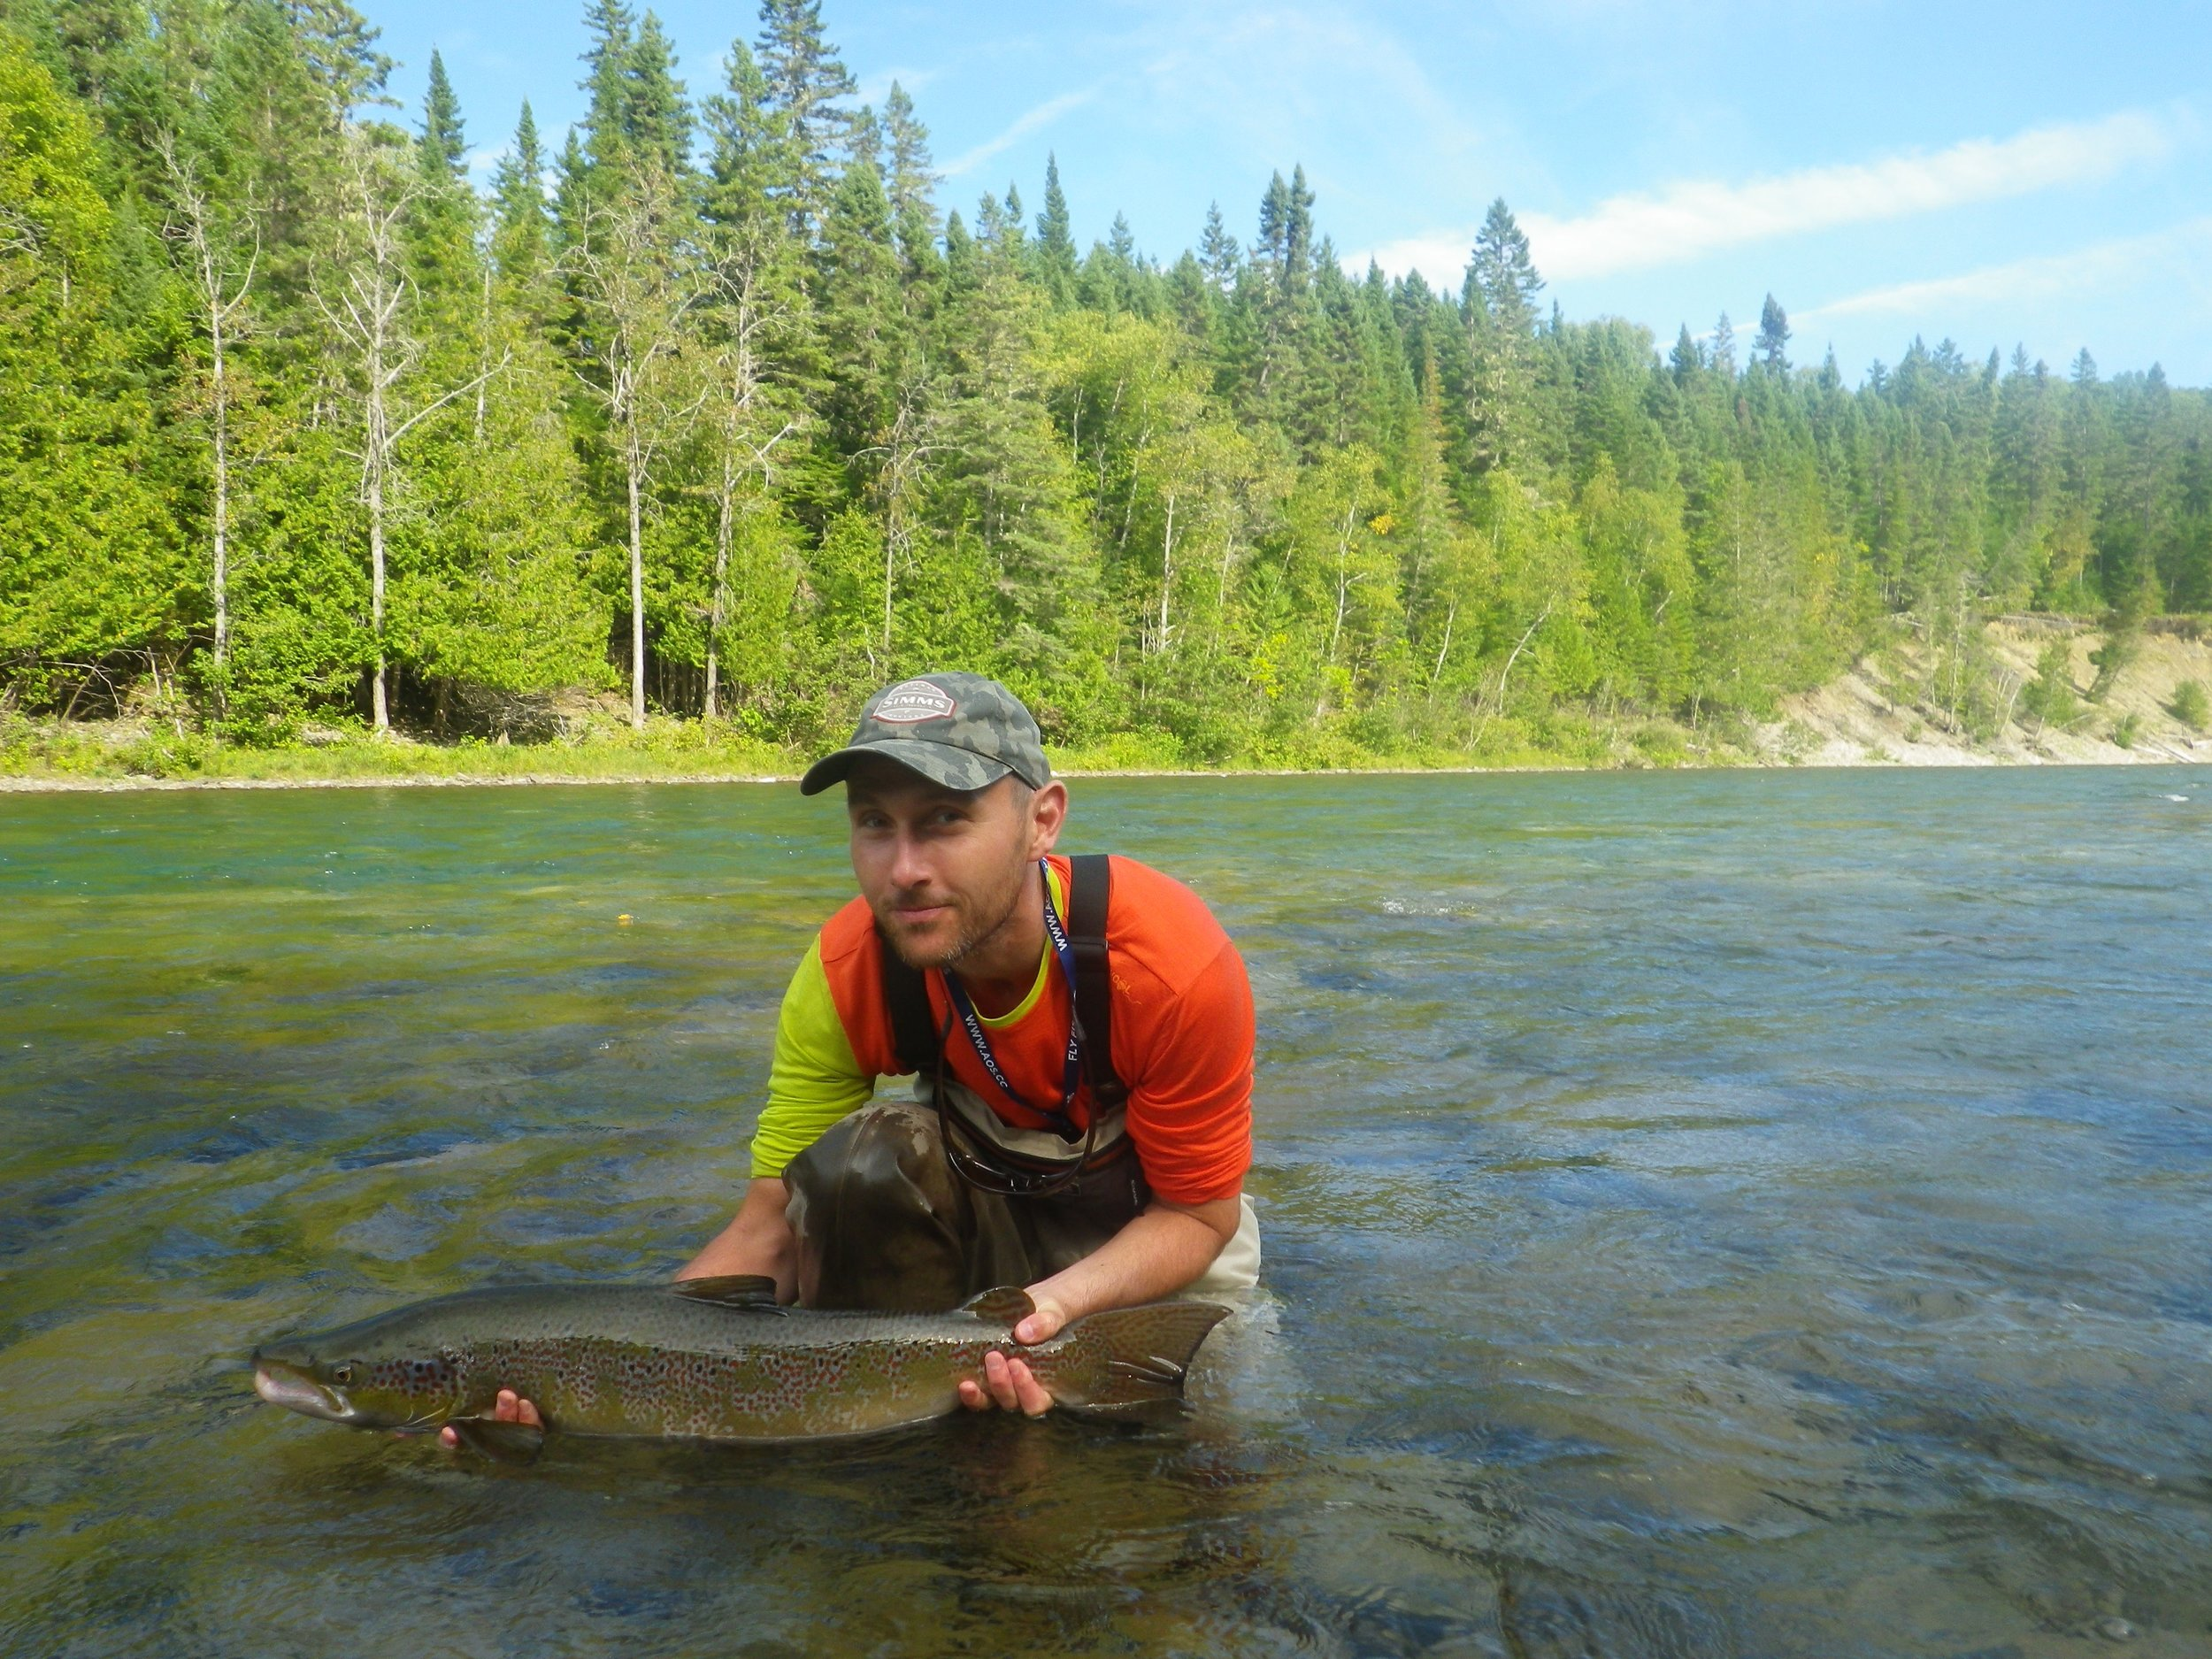 Klaus Vander lands this fine salmon on the Bonaventure, Nice salmon Klaus.